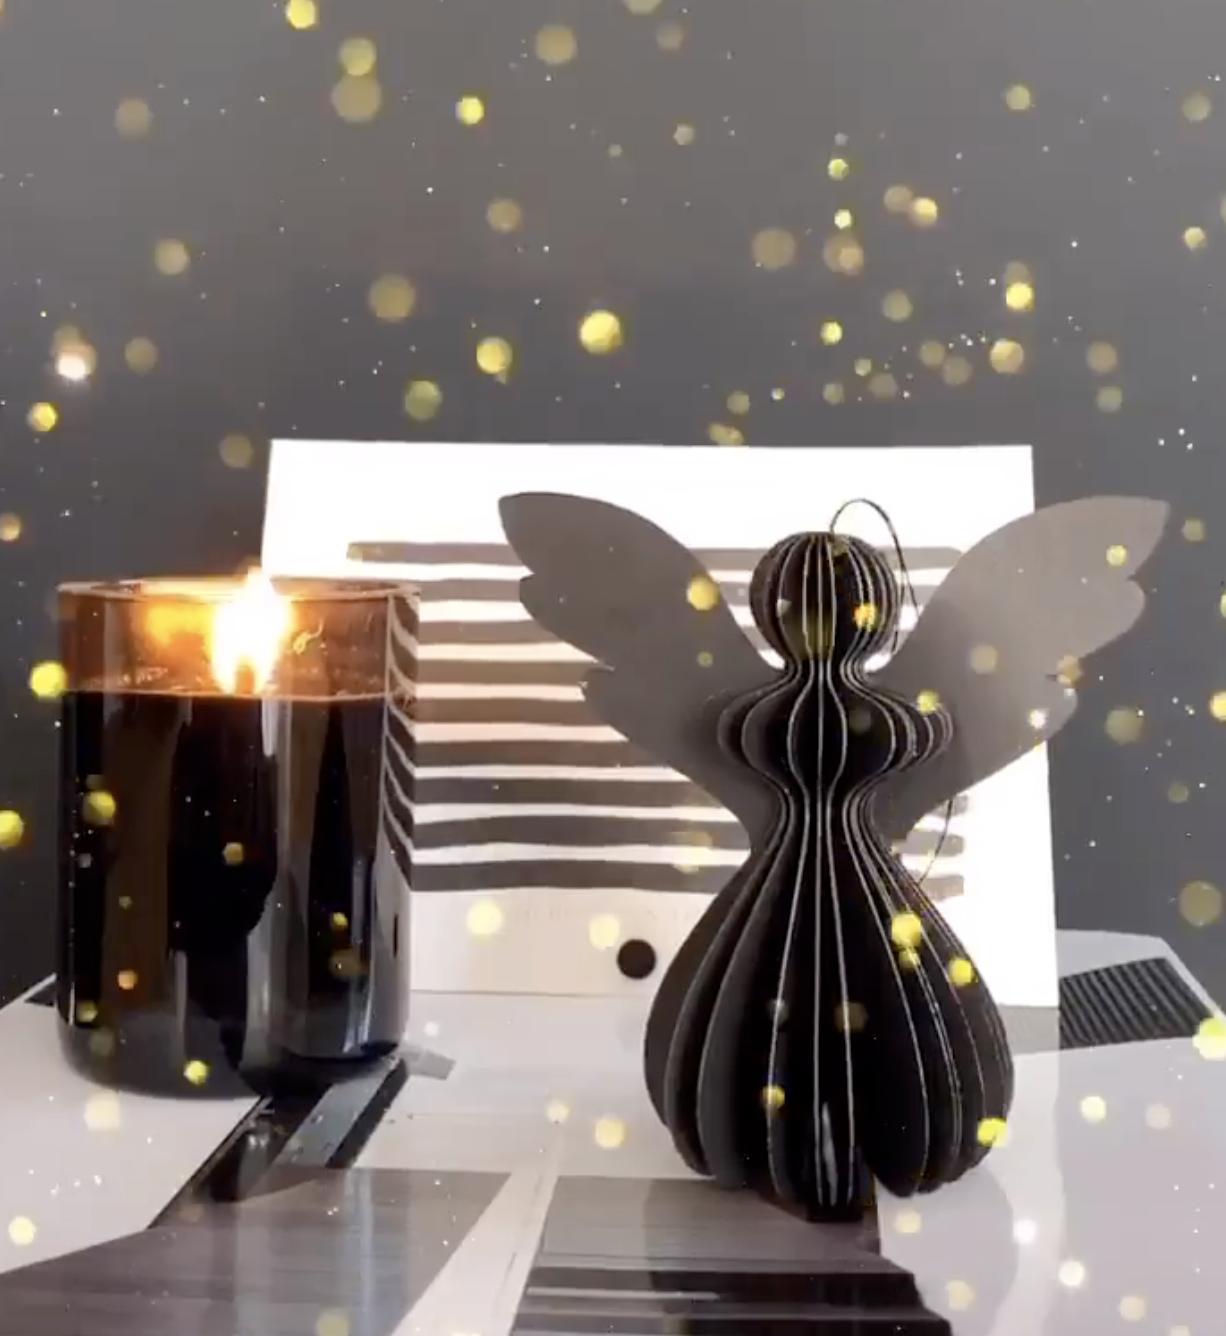 #weihnachtsdeko #homesweethome #mostwonderfultimeoftheyear #weihnachten #weihnachtsdeko #engel #wiwaconcept